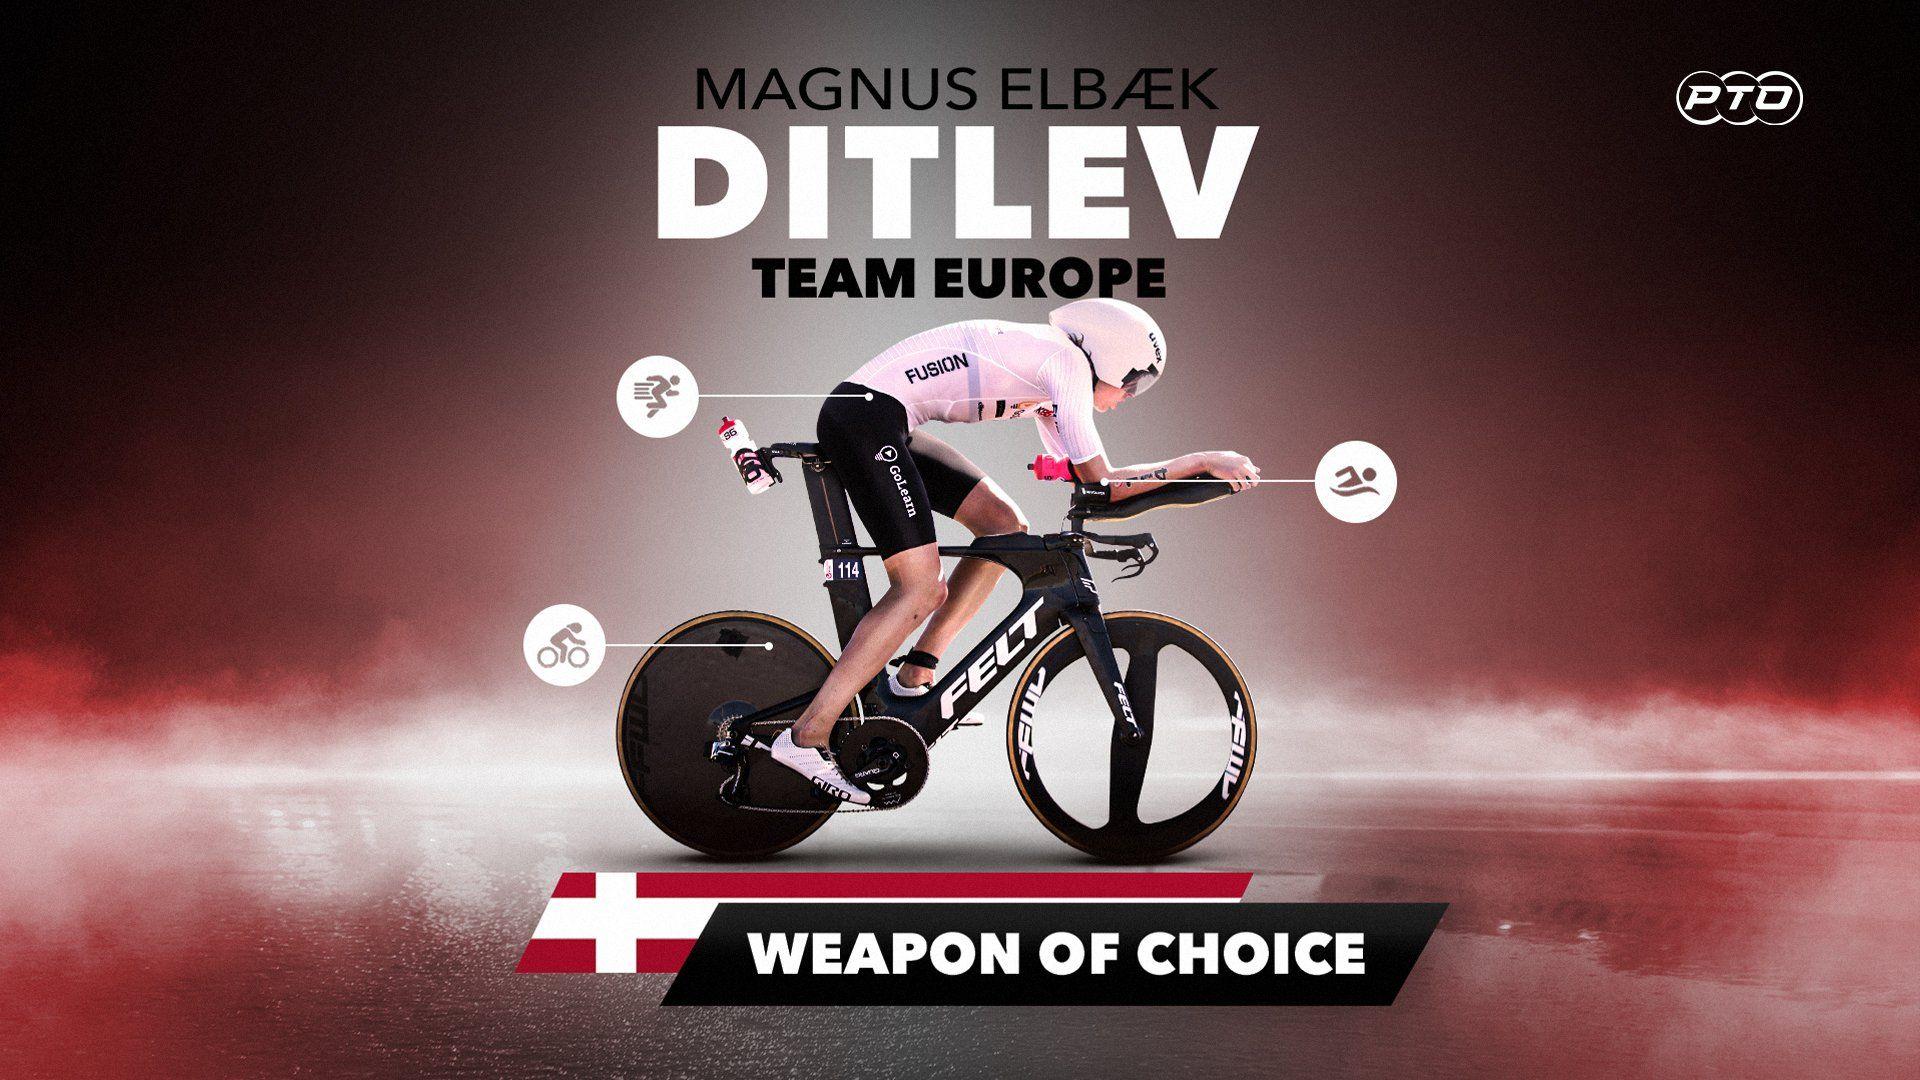 Weapon of Choice || Magnus Elbæk Ditlev